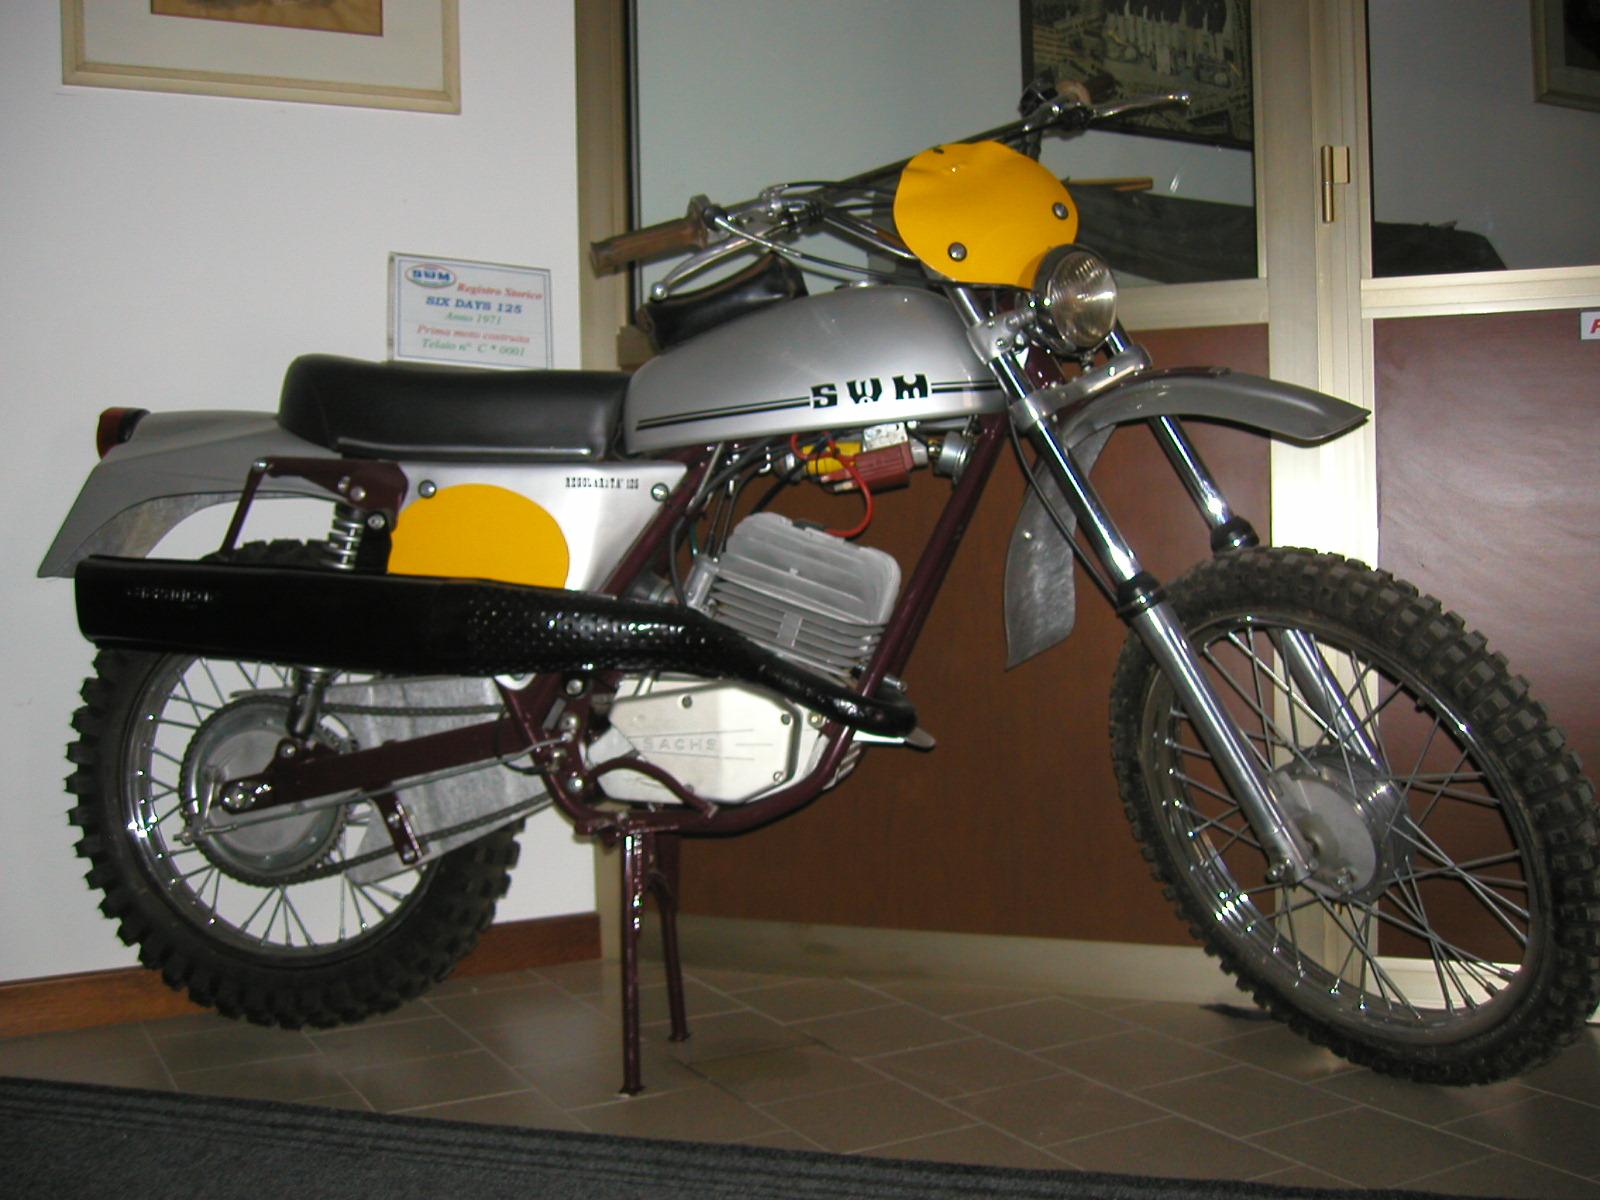 swm 125